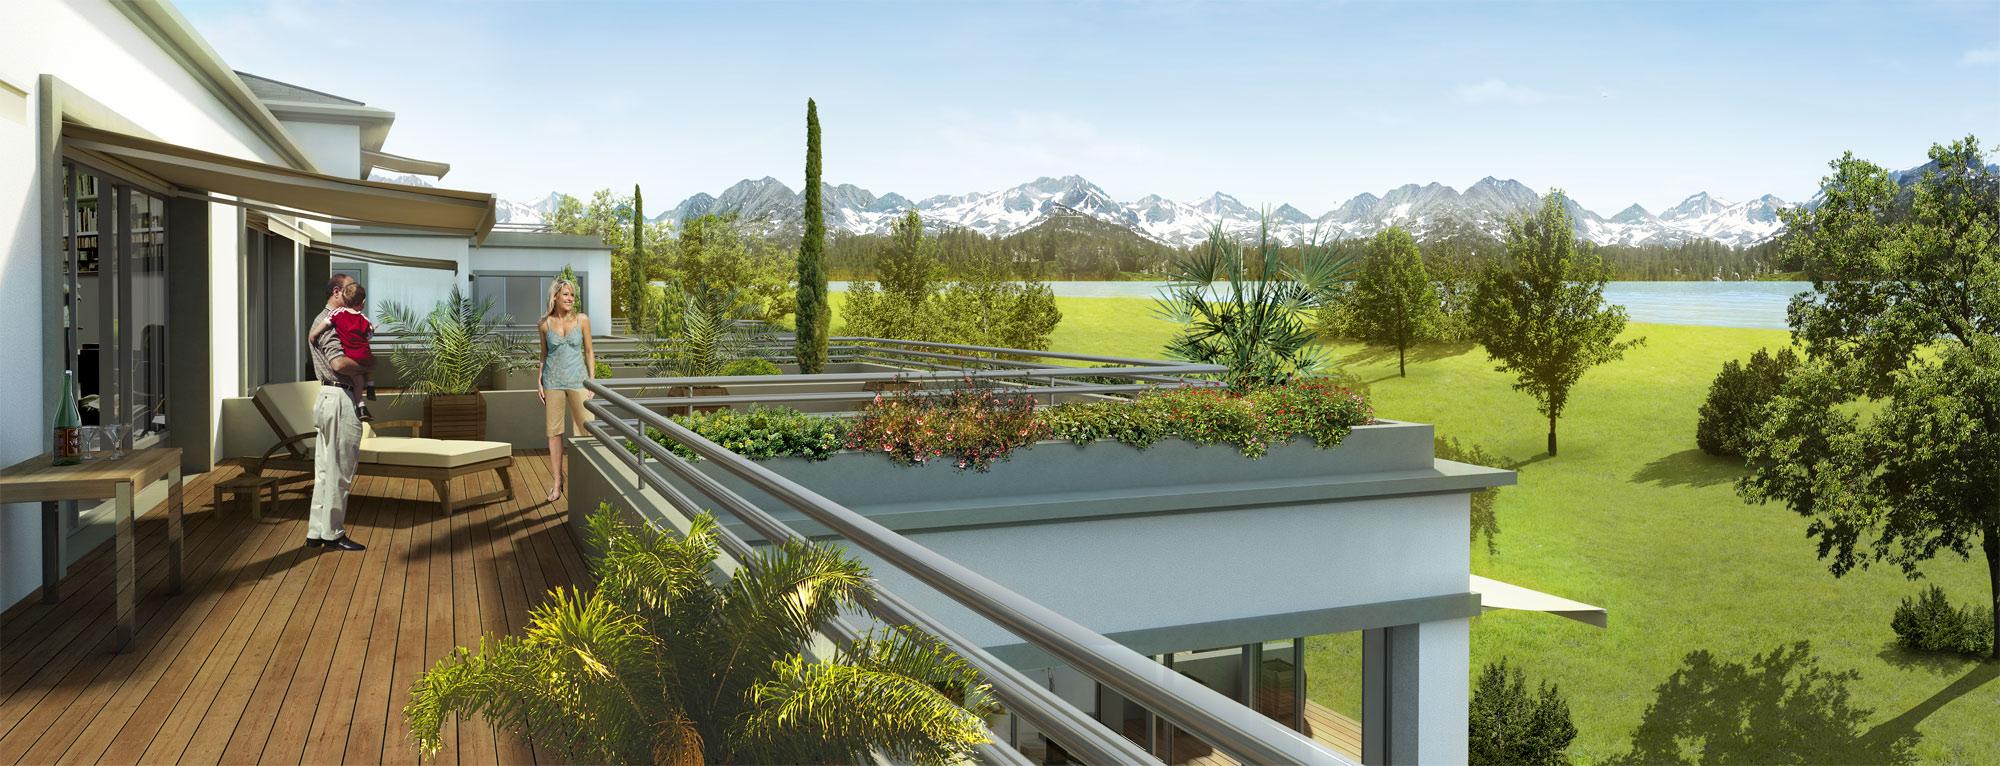 Perspective D Une Villa : Perspective d villa terrasse julien weber